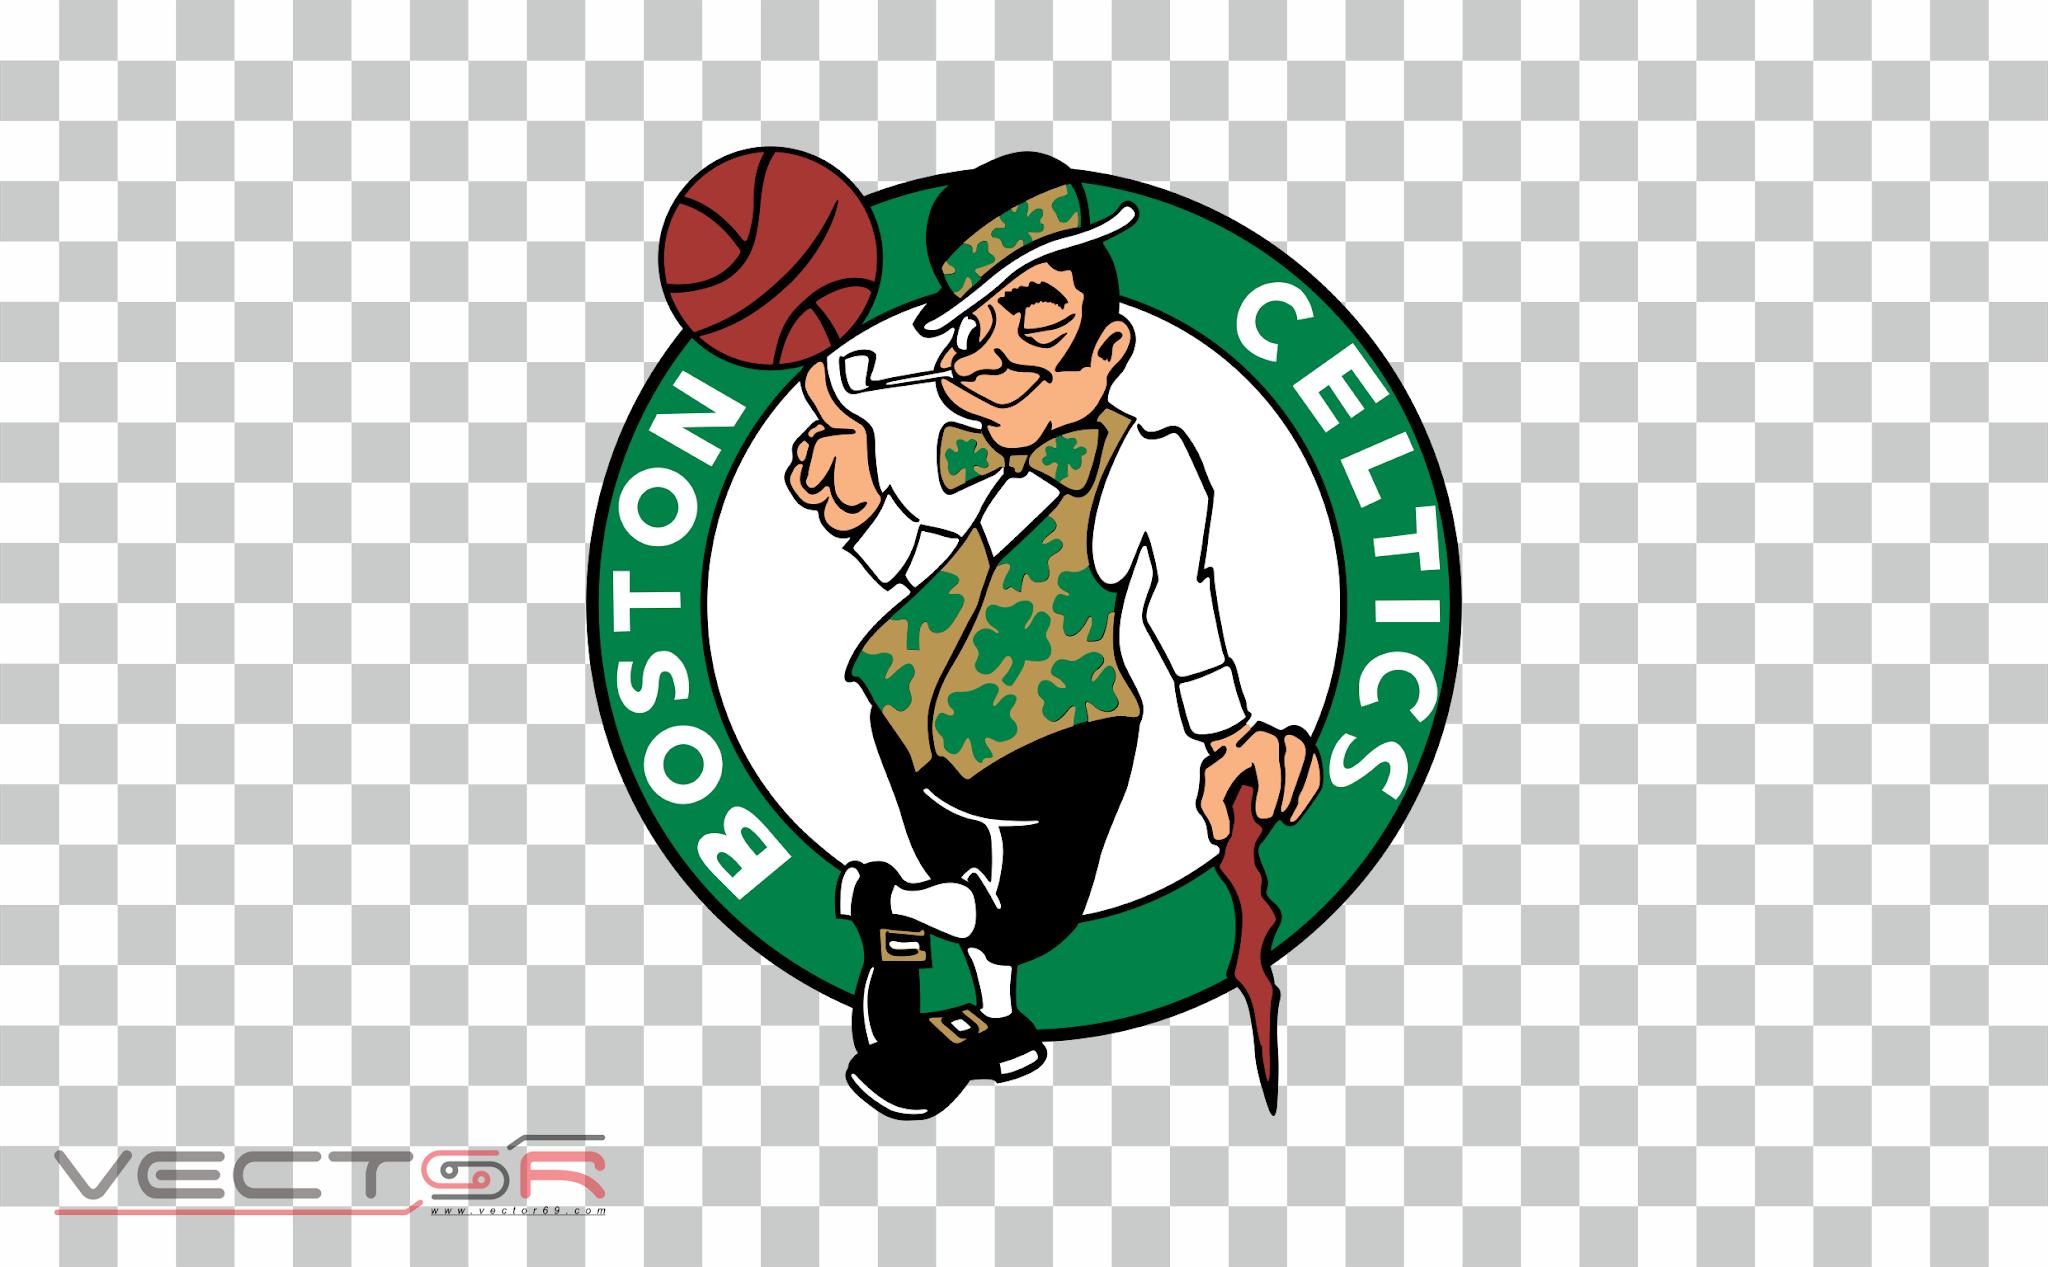 Boston Celtics Logo - Download .PNG (Portable Network Graphics) Transparent Images